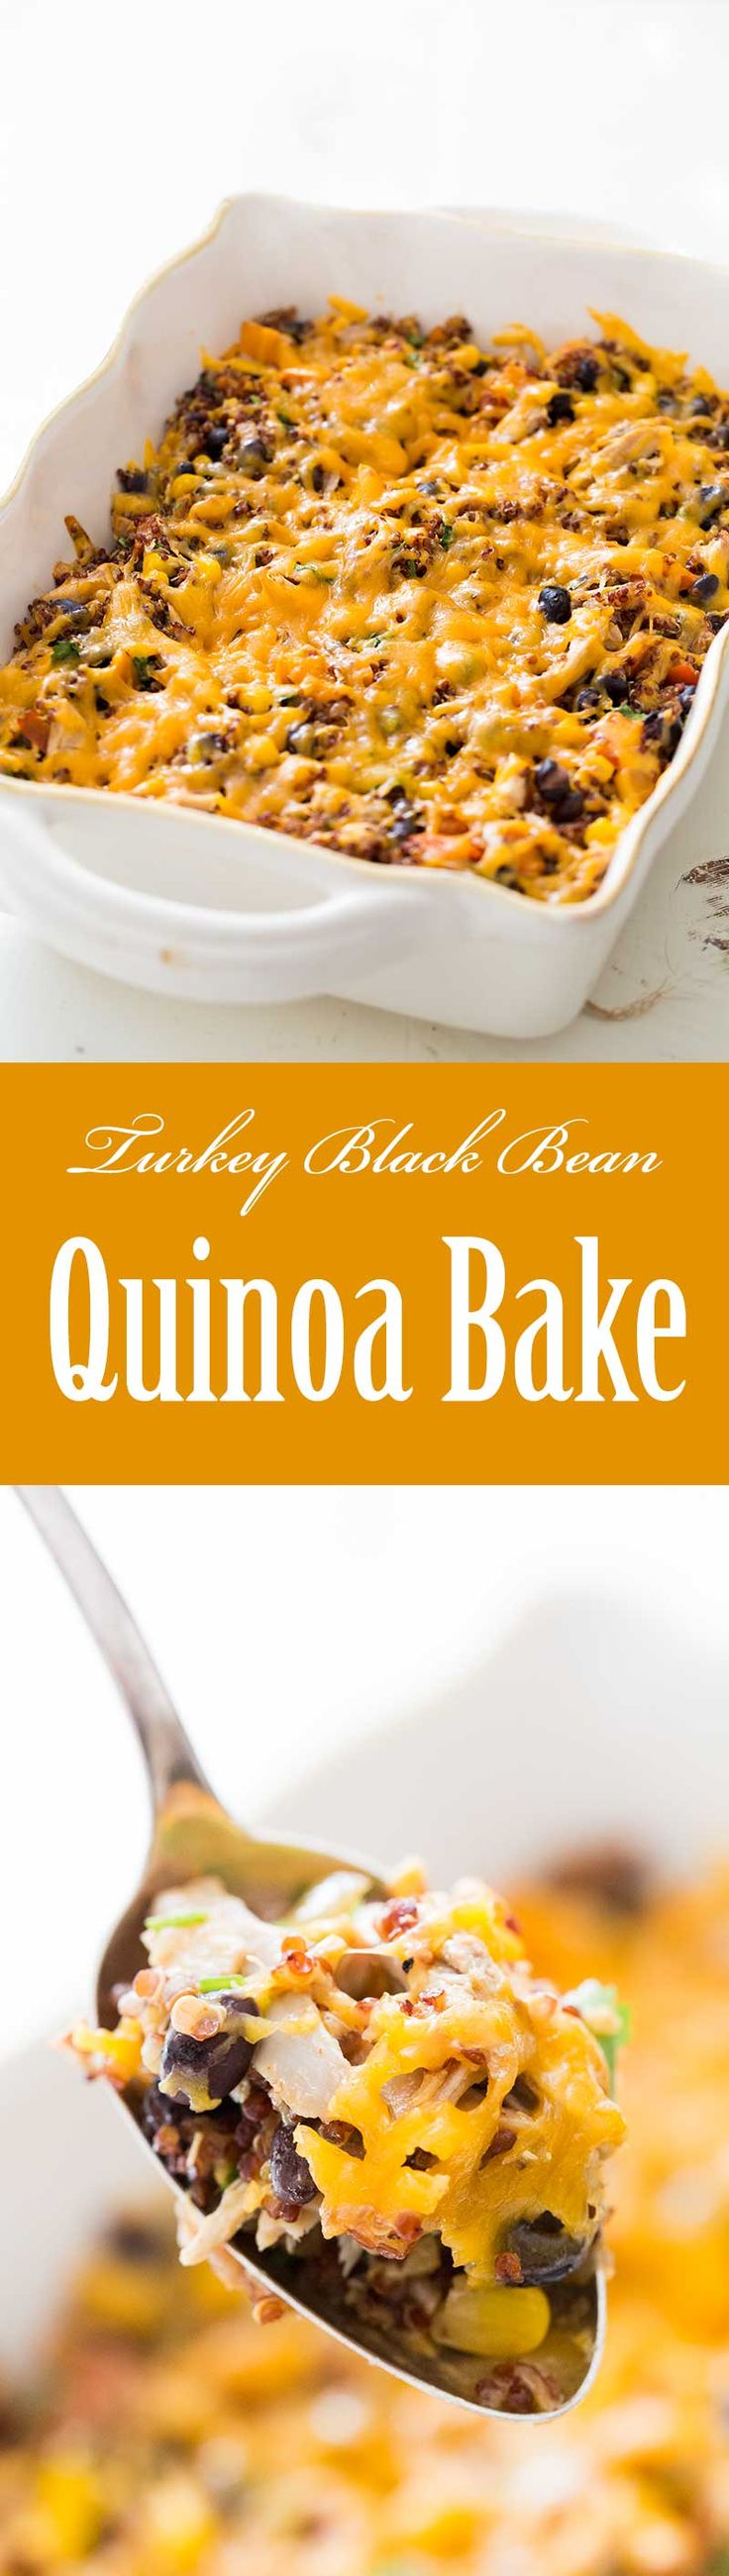 1000+ images about Food - Quinoa on Pinterest | Black bean salads ...